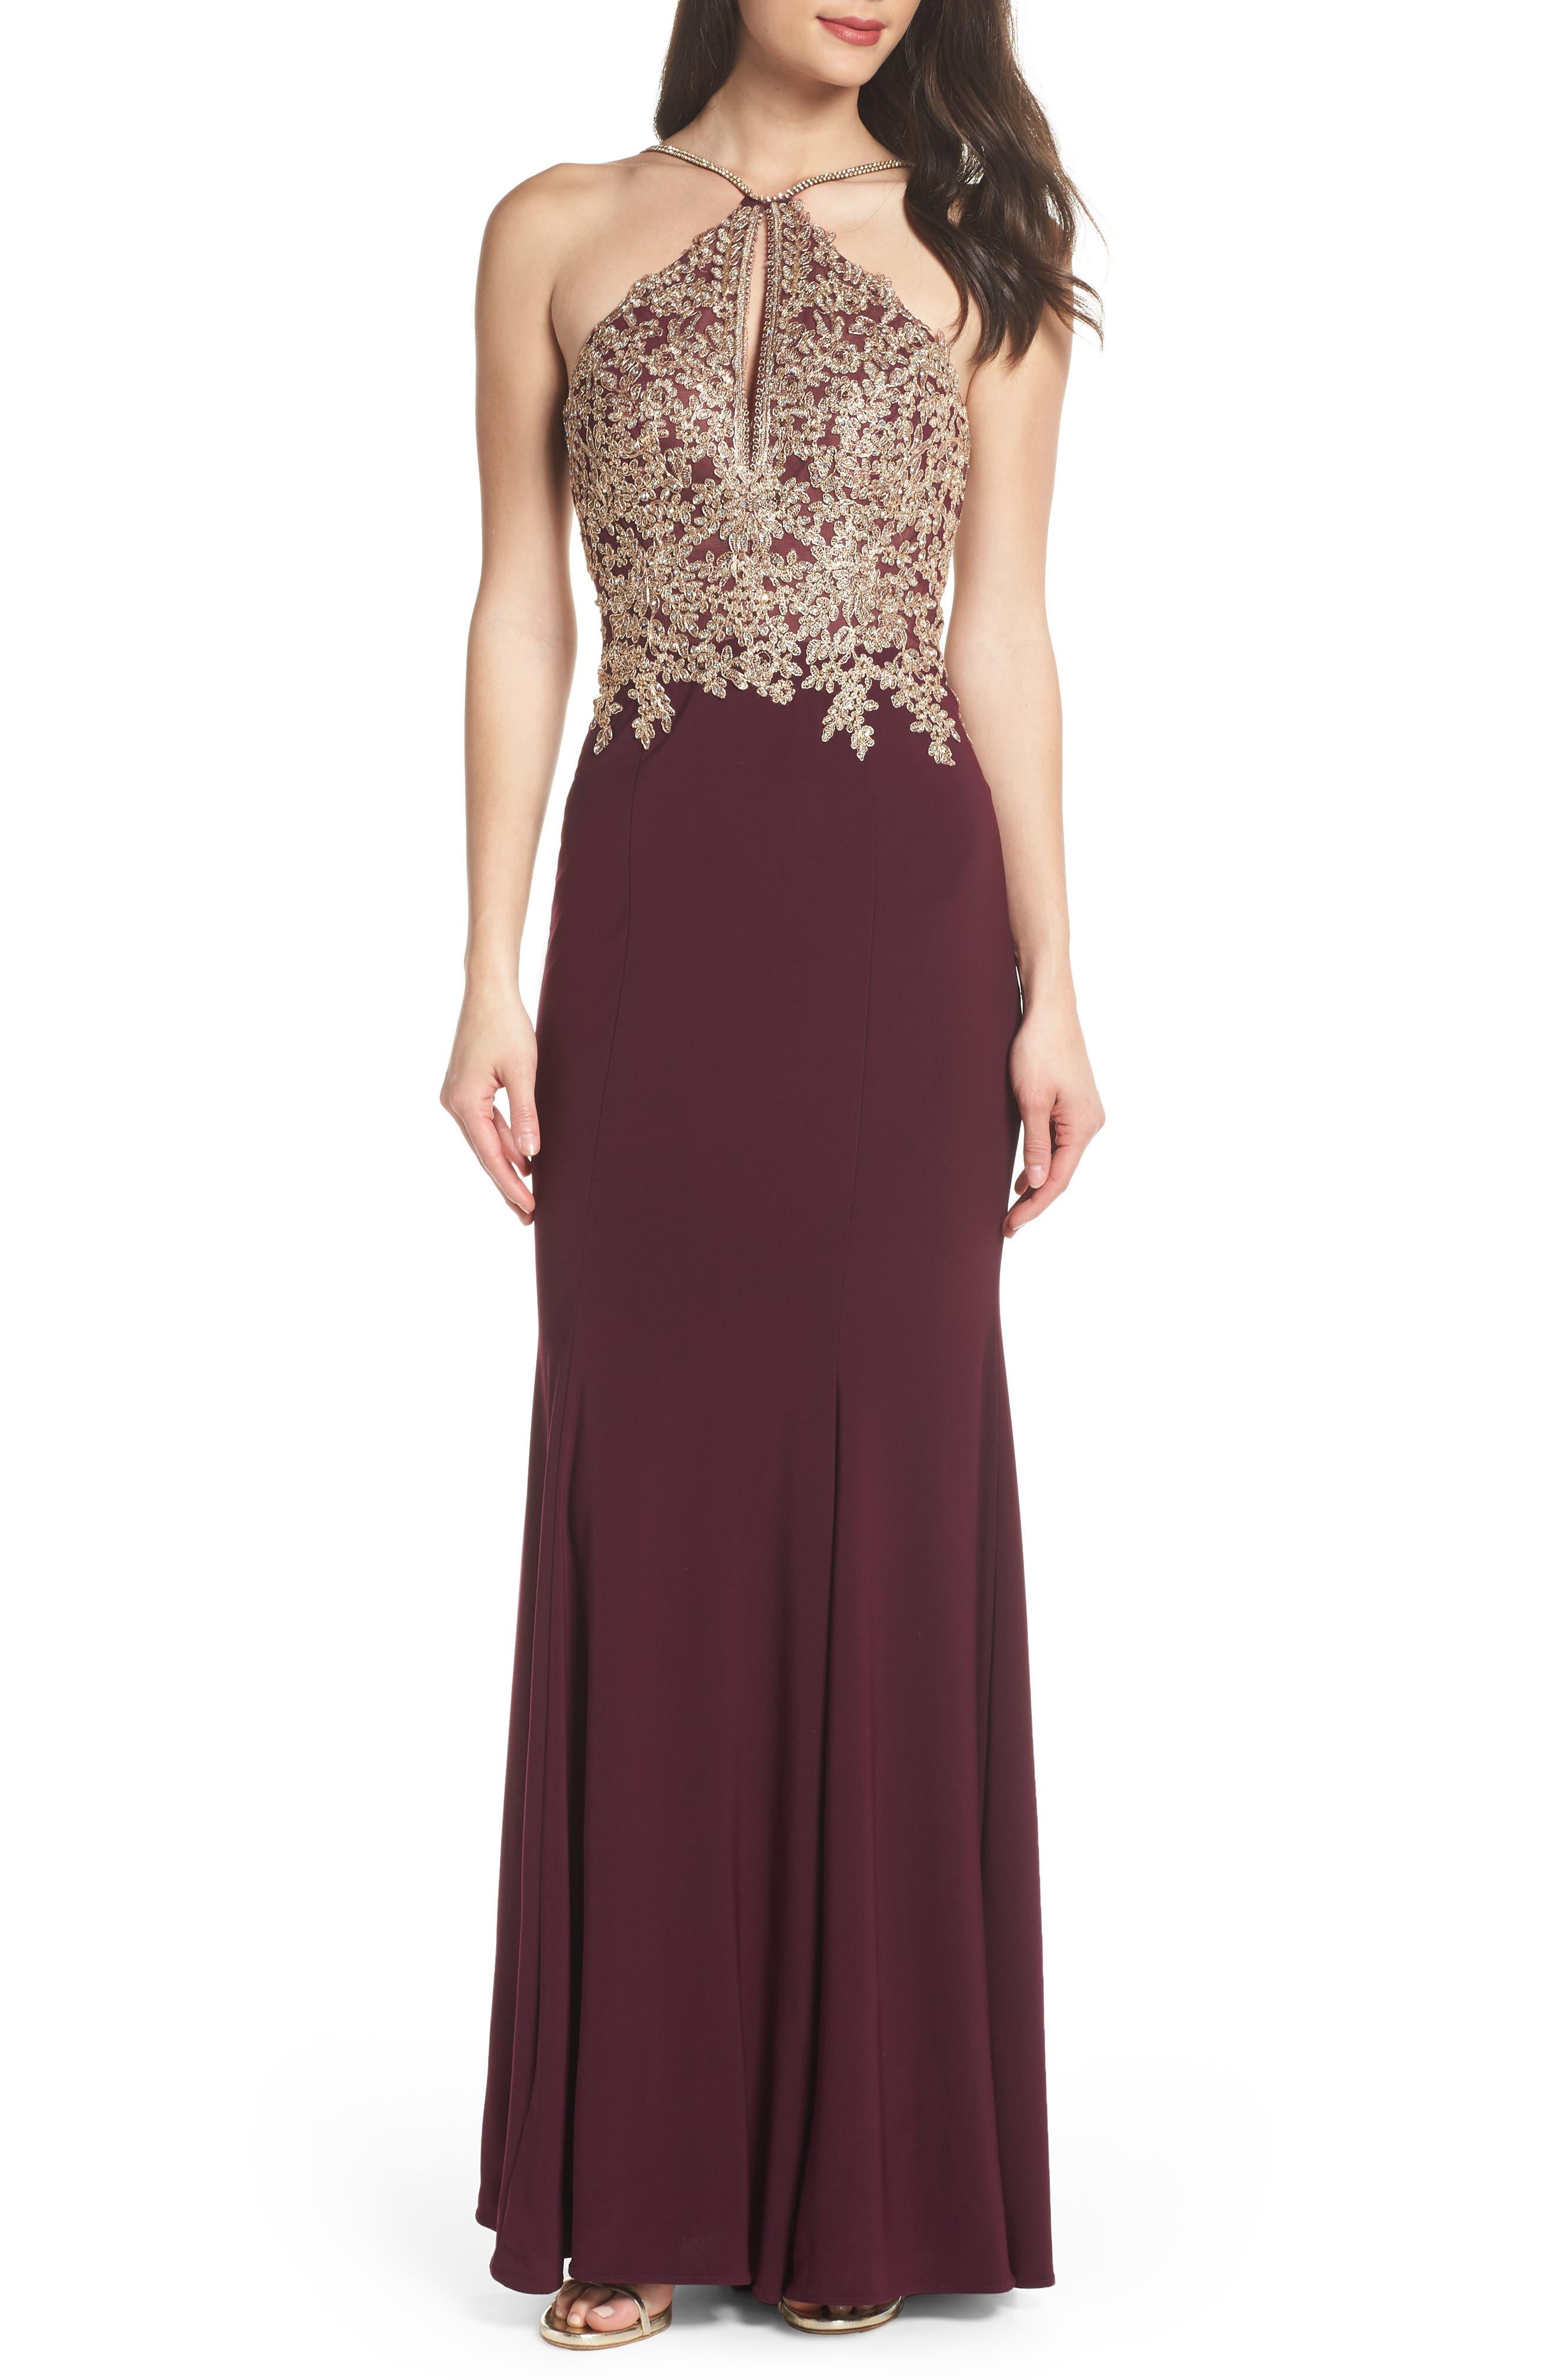 Black and Gold Jovani Prom Dresses 2018